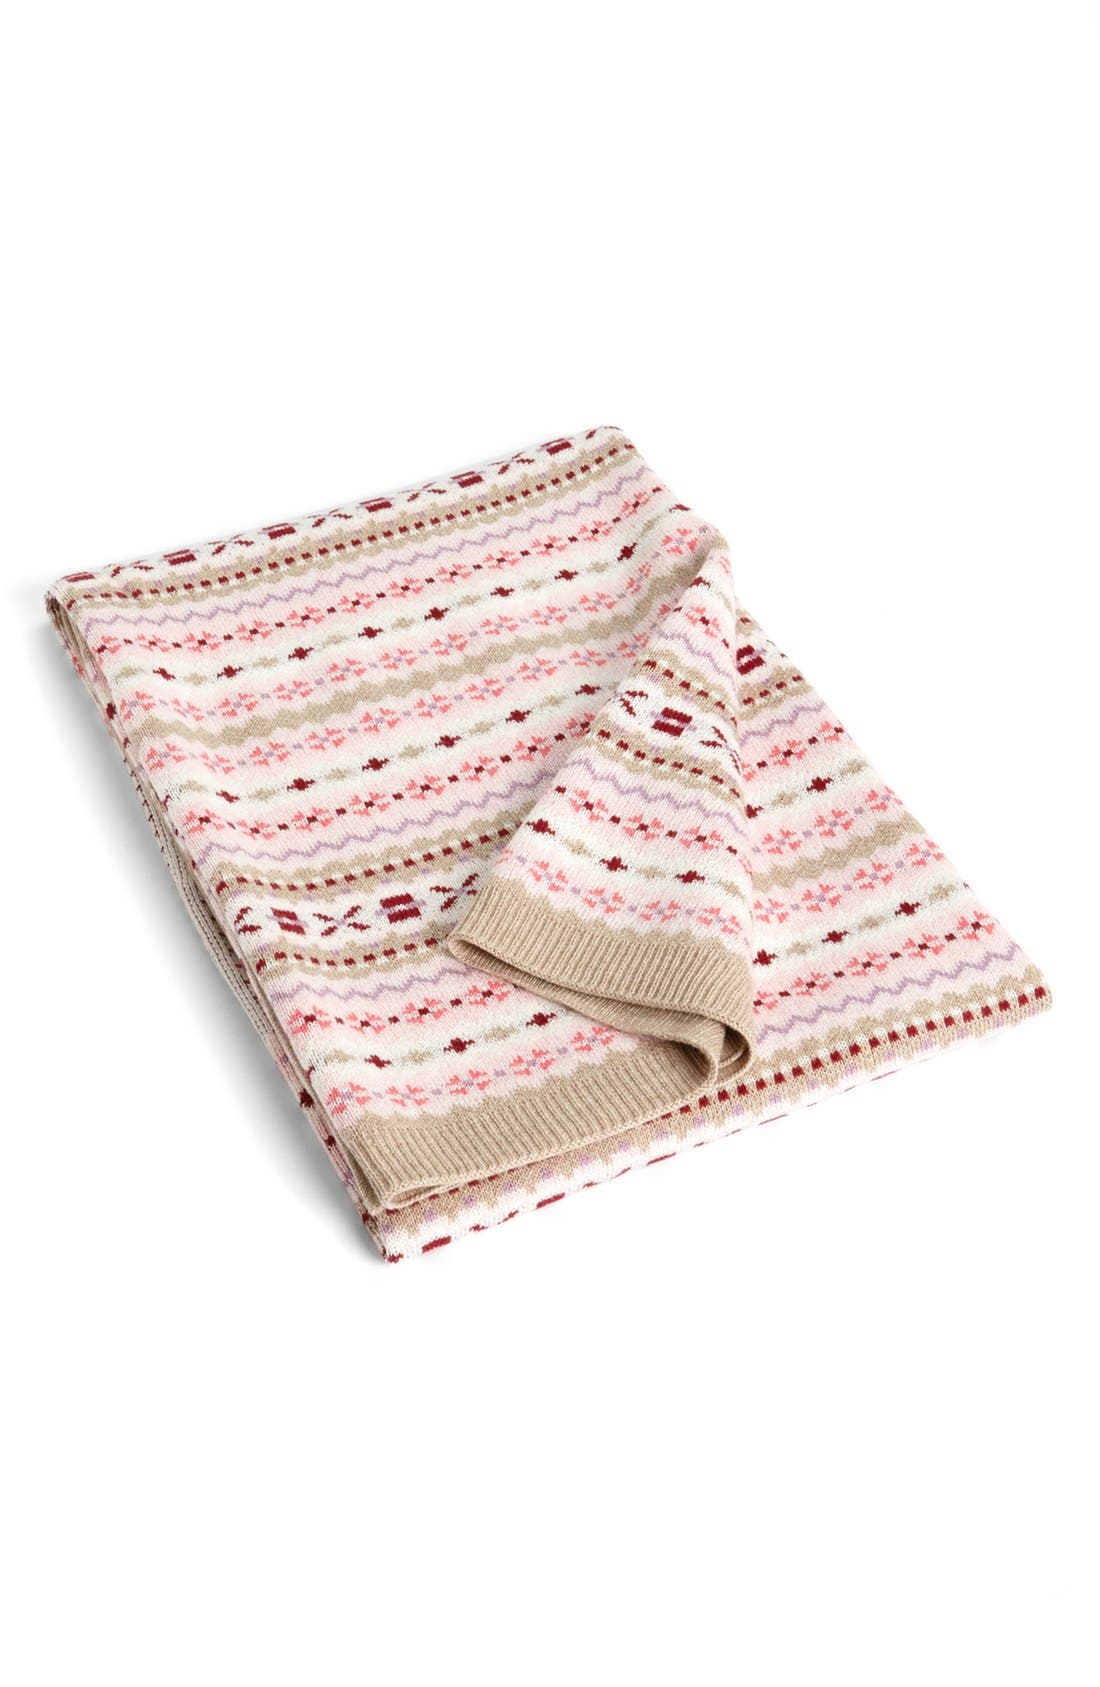 Alternate Image 1 Selected - Nordstrom Baby Cotton & Cashmere Knit Blanket